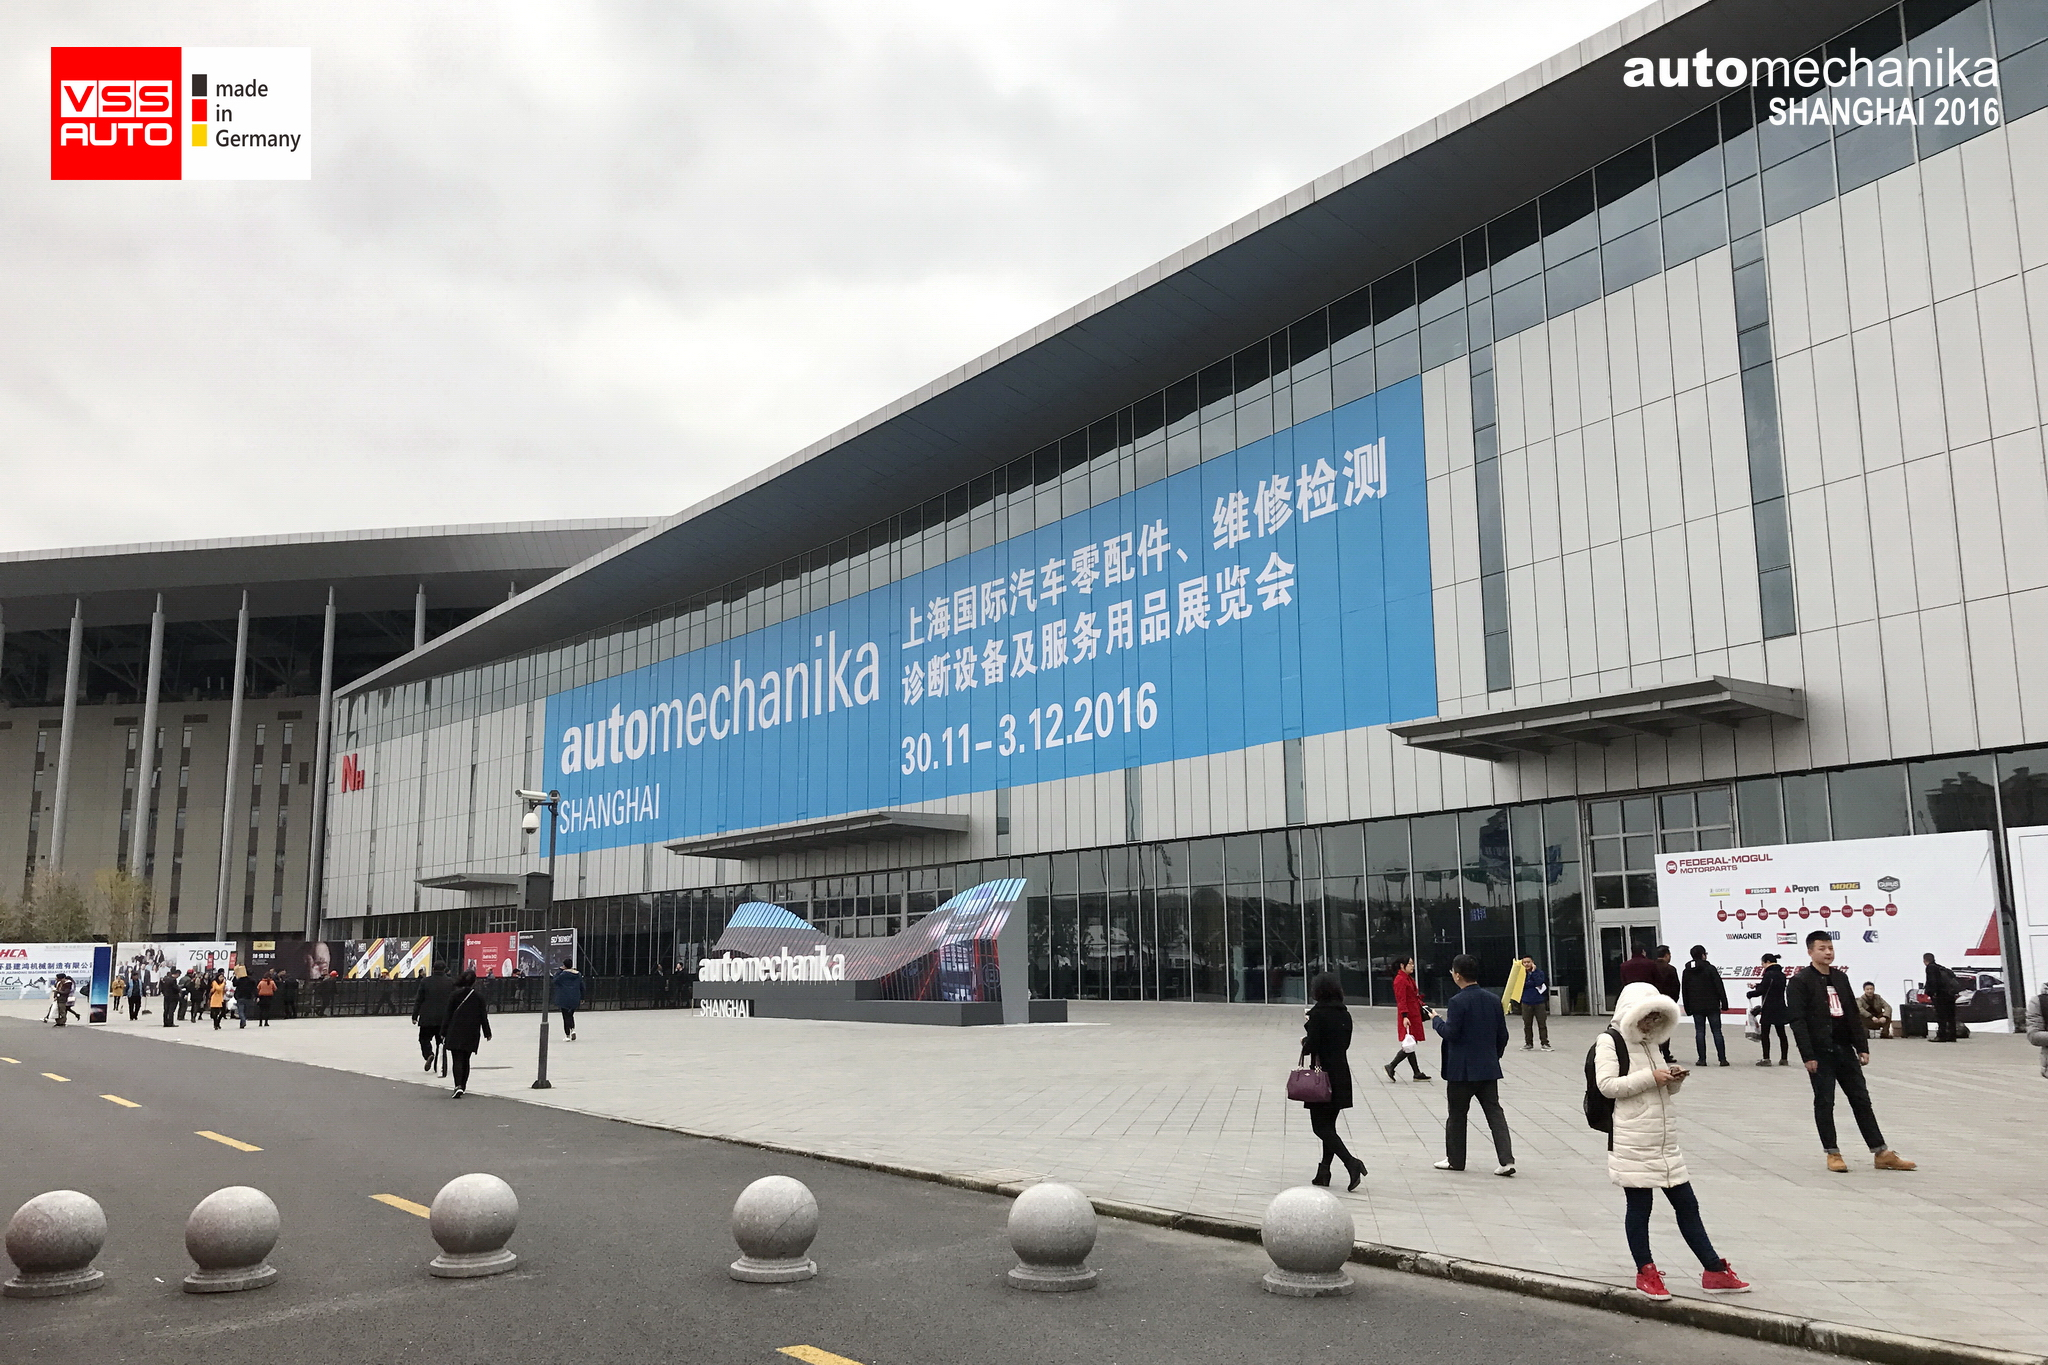 vss-auto-automechanika-shanghai-1